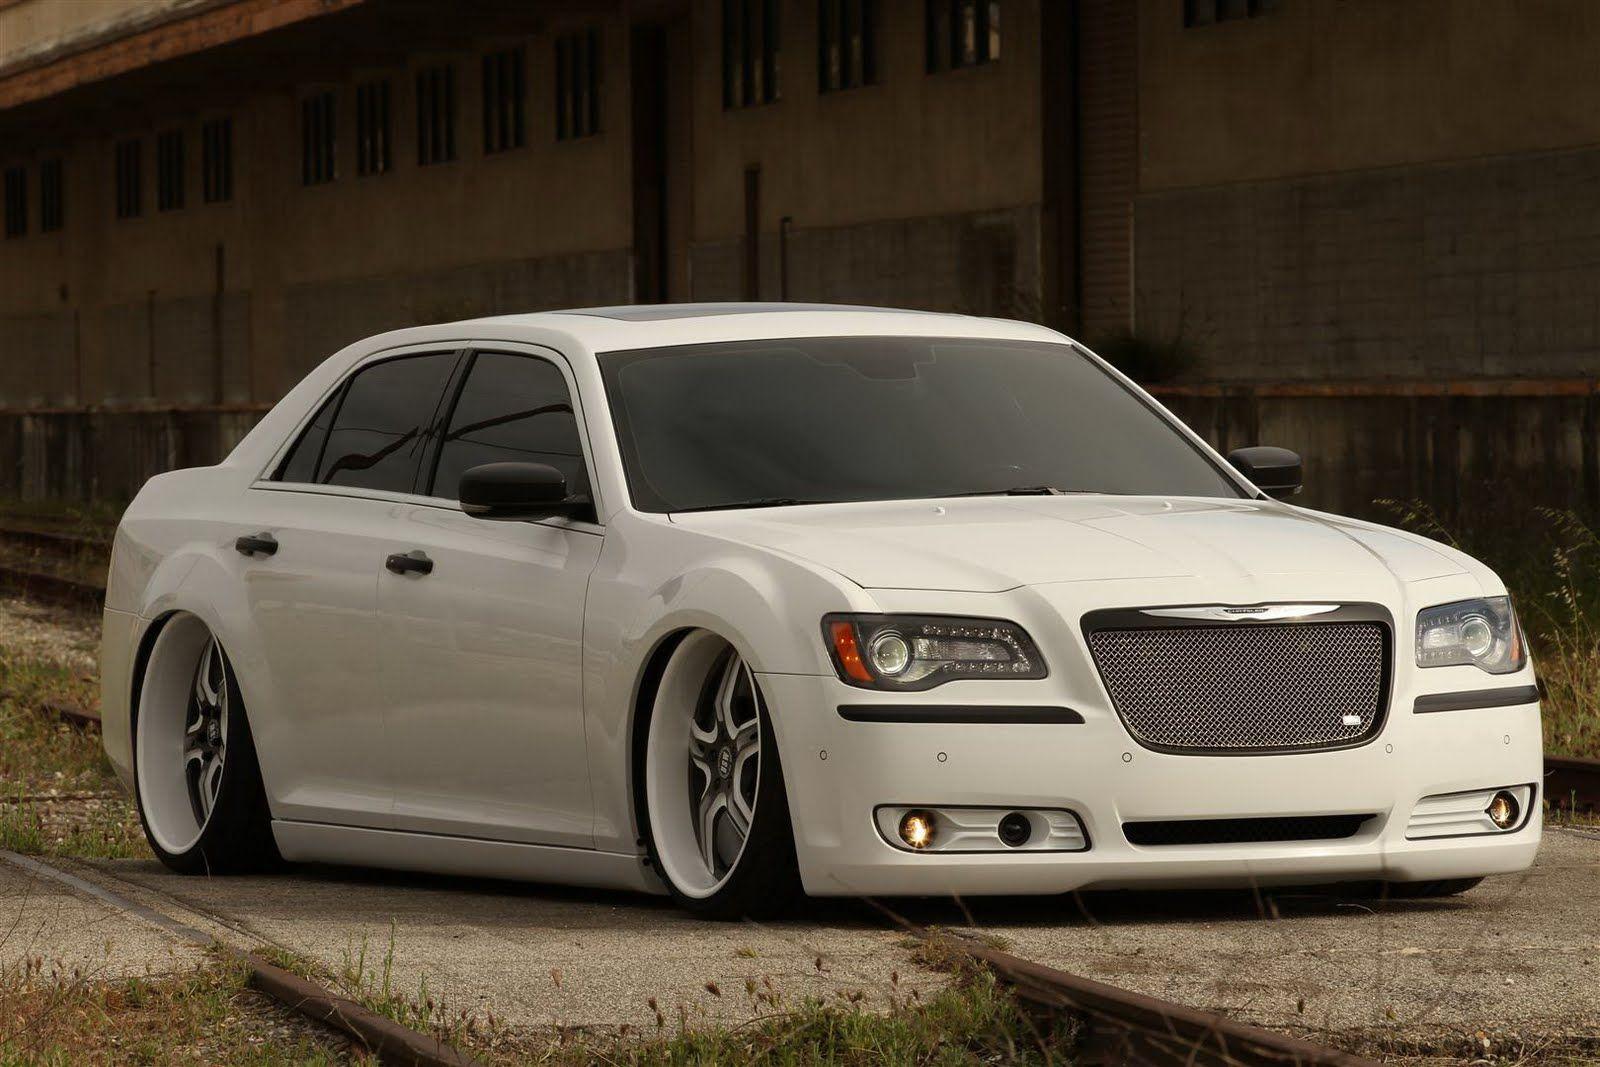 Custom Cars 2011 Chrysler 300c Cars To Be Fully Customized